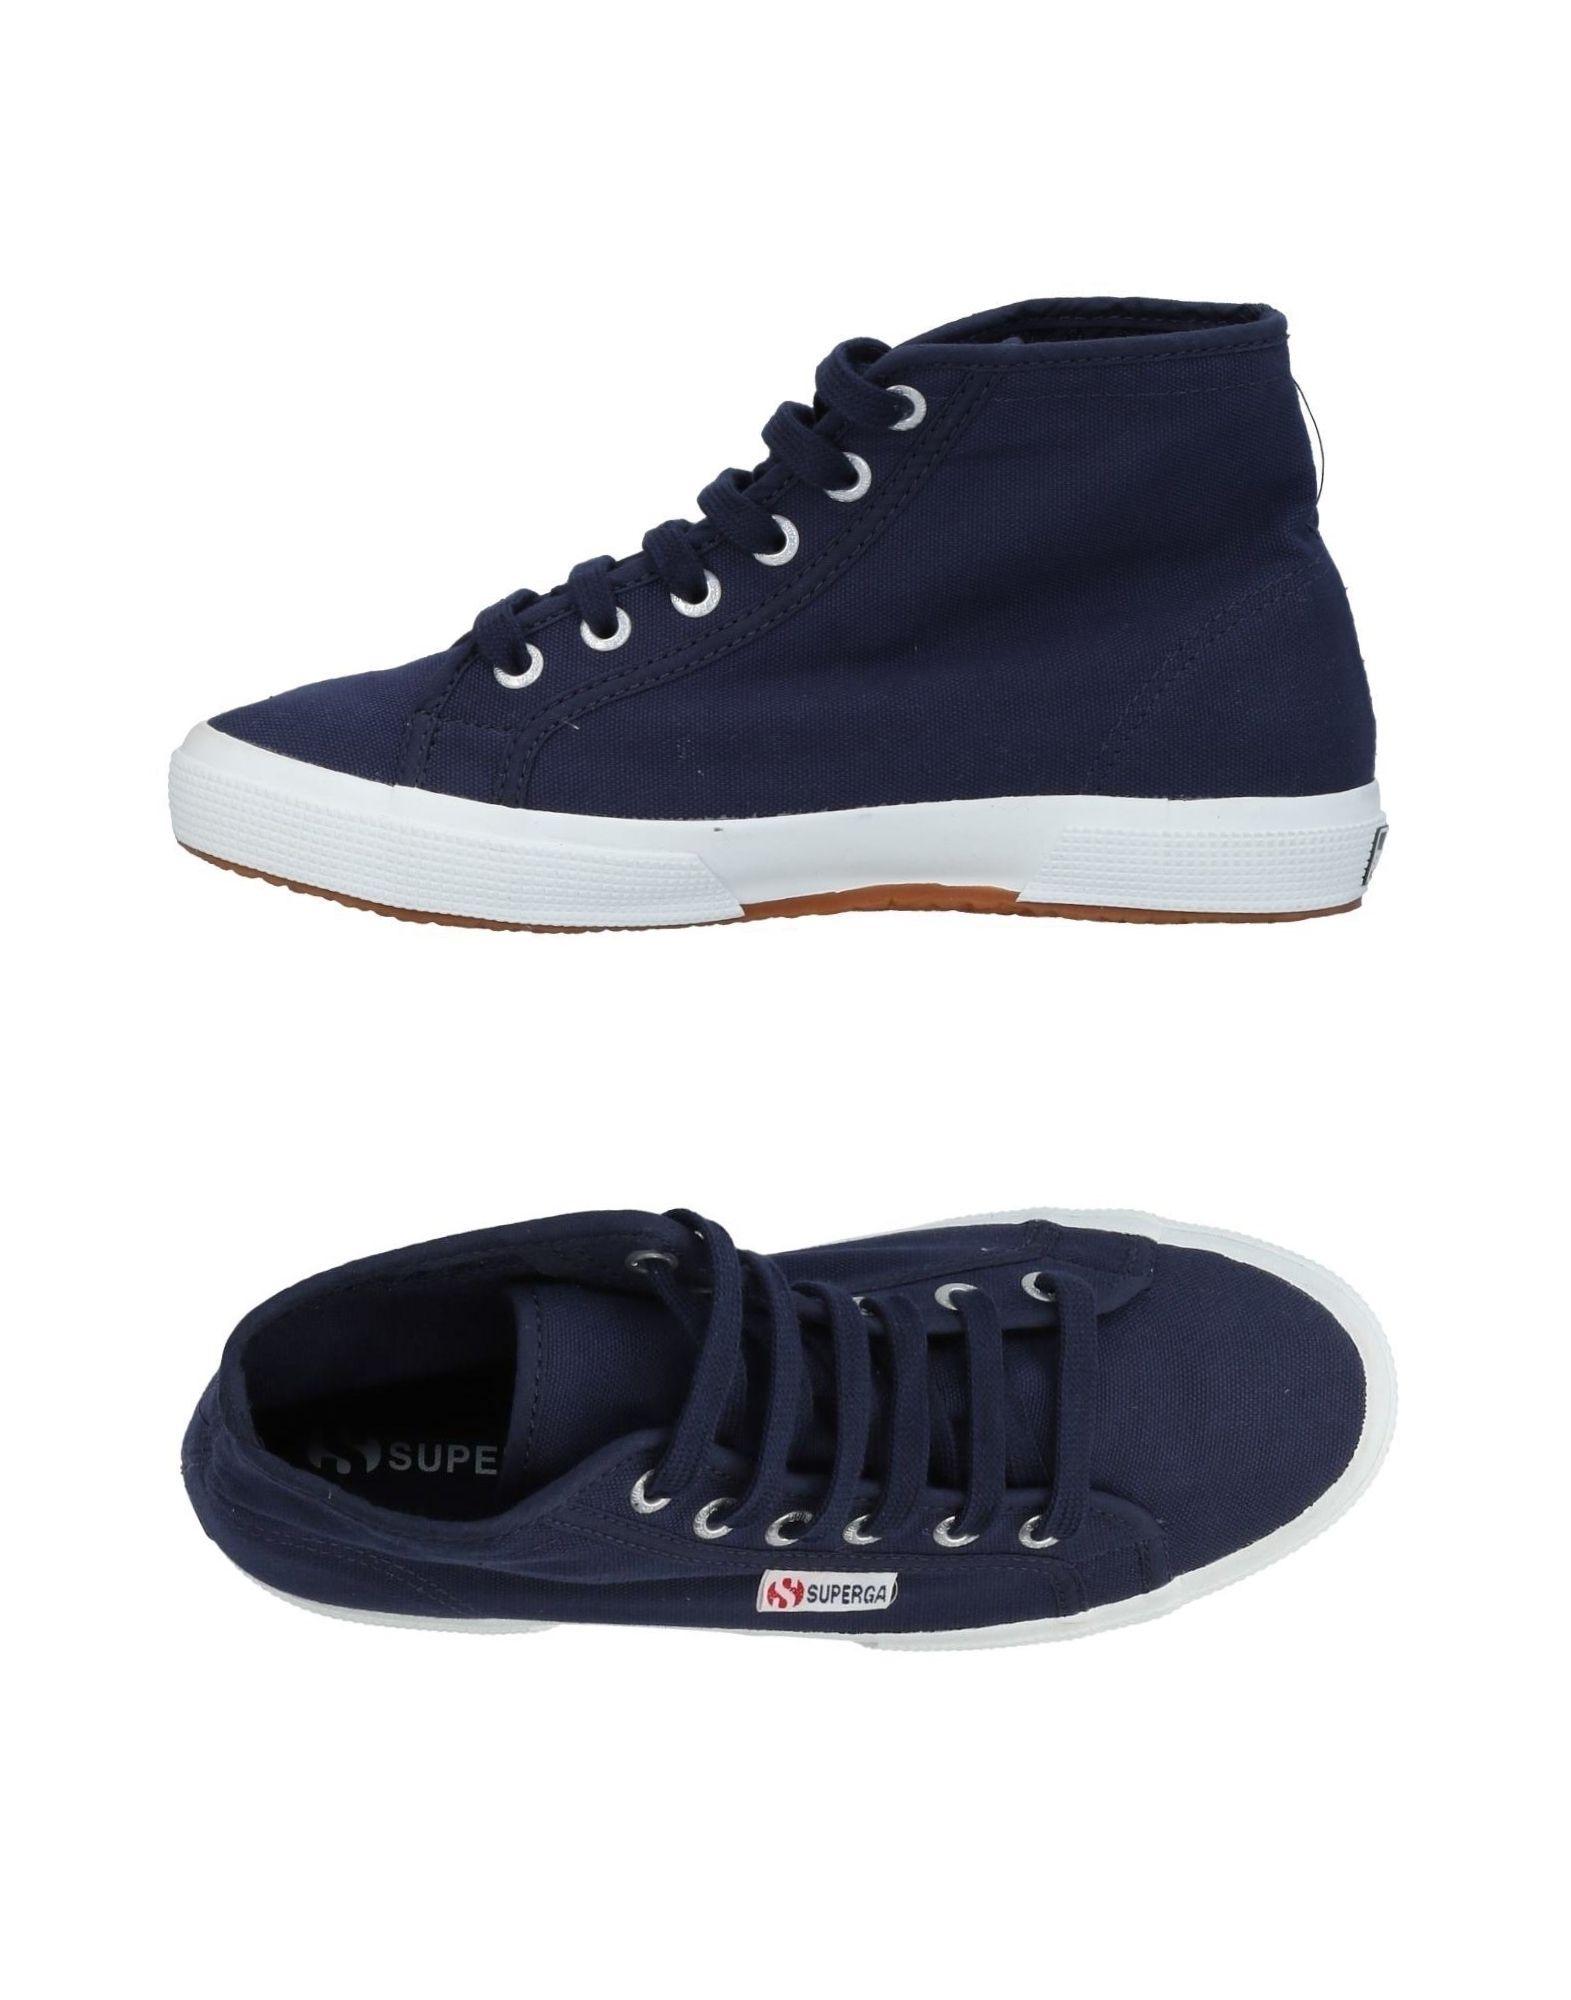 Haltbare Mode billige Schuhe Superga® Sneakers Damen  11438487OV Heiße Schuhe